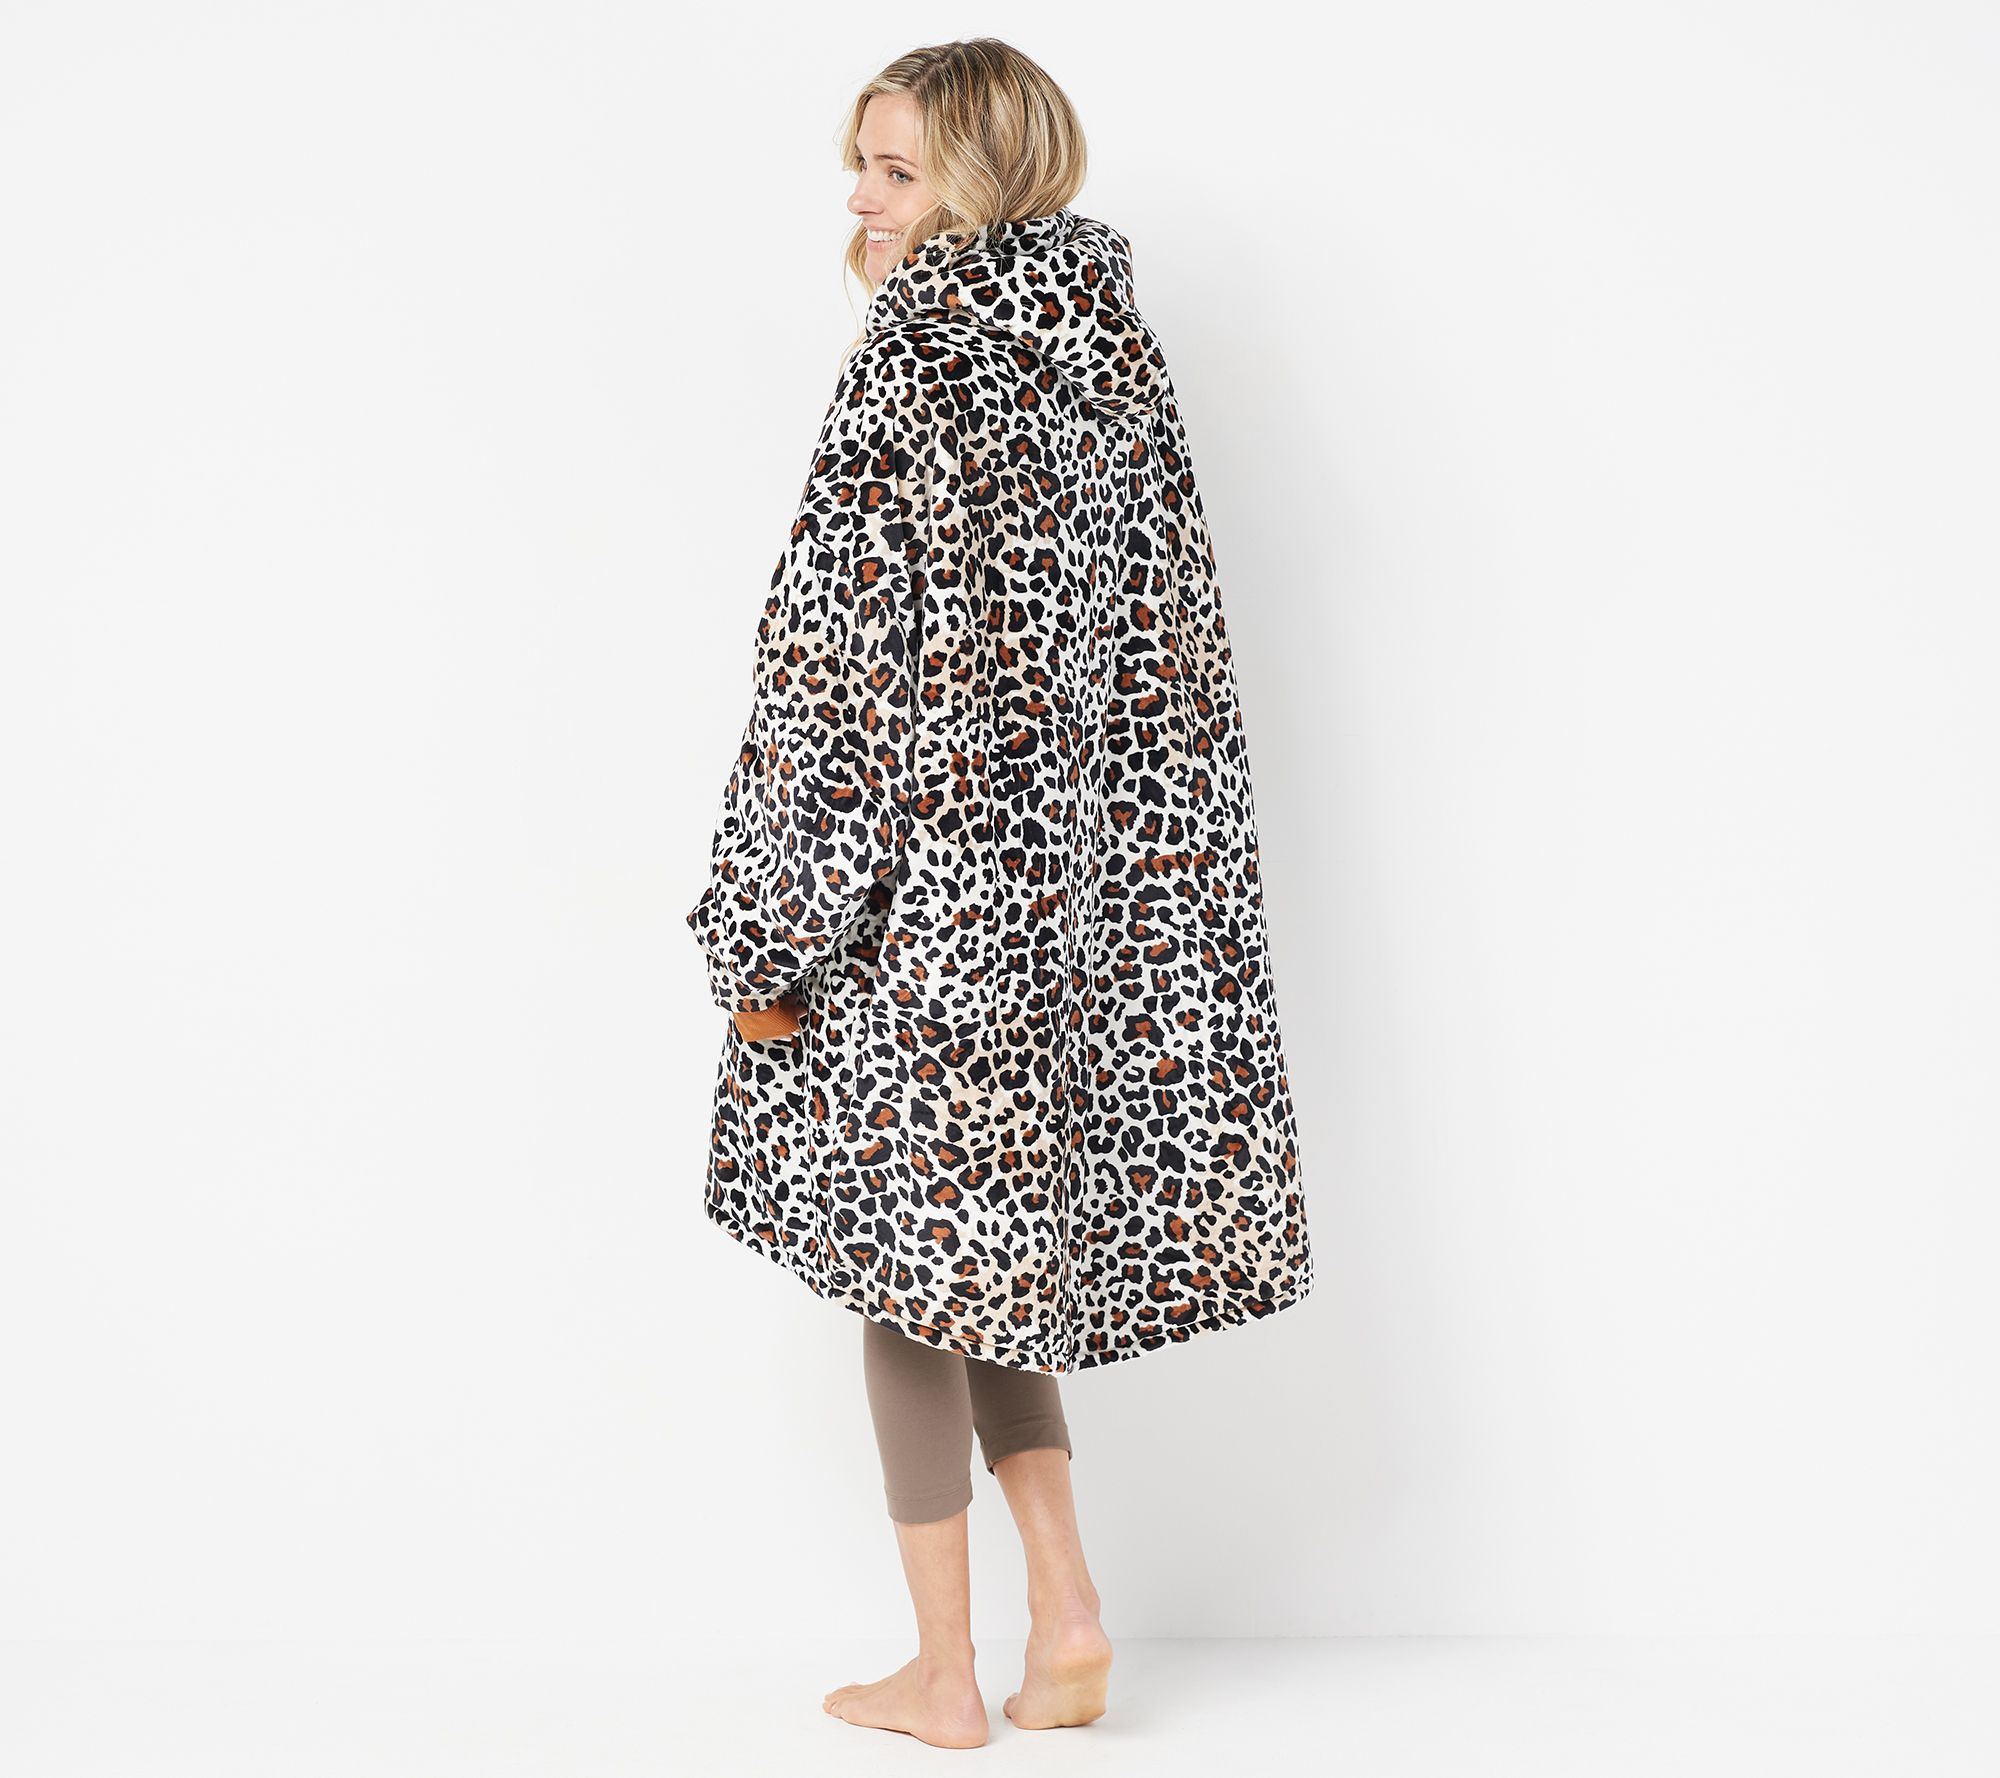 f27f7cdbf The Comfy Original Oversized Blanket Sweatshirt — QVC.com